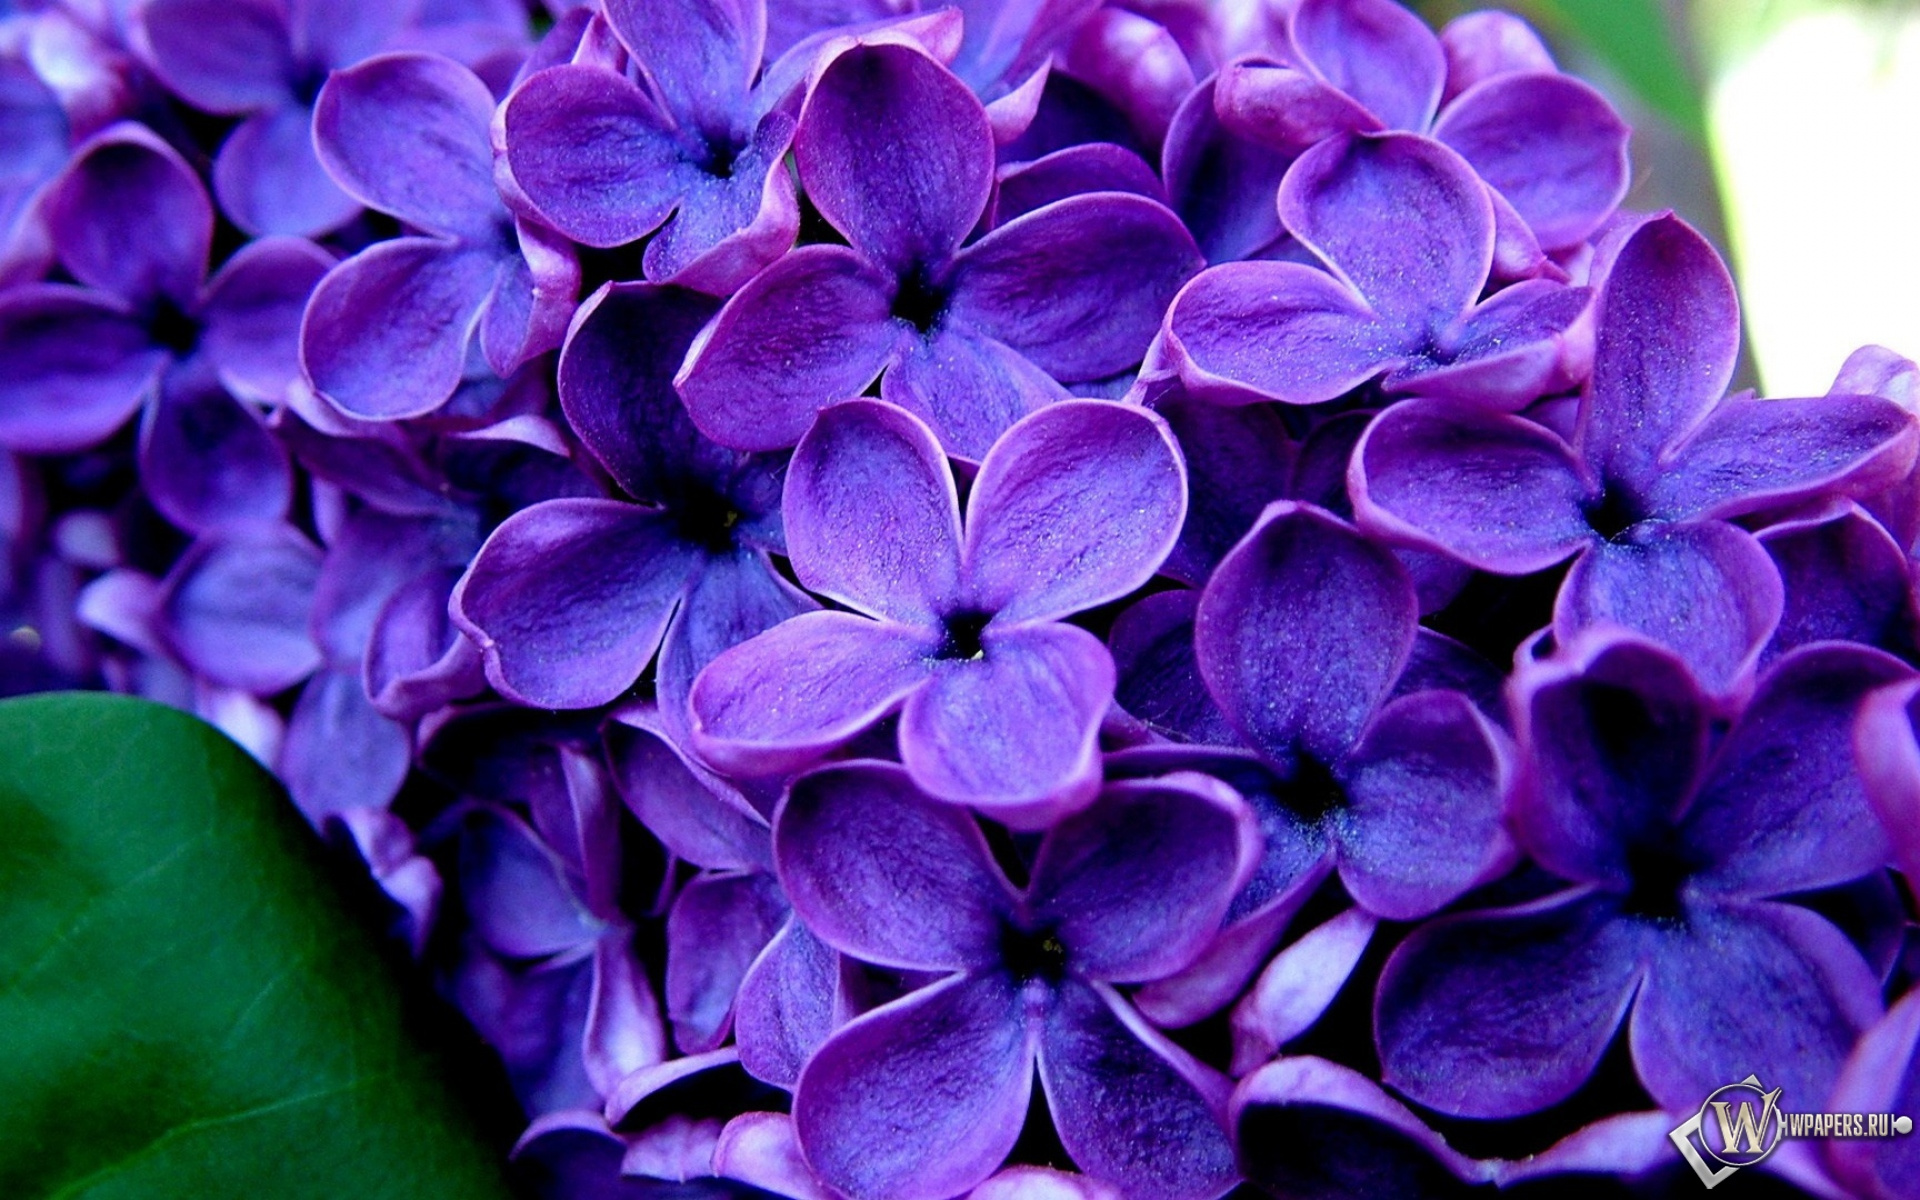 Цветы цветы фиолетовый 1920x1200